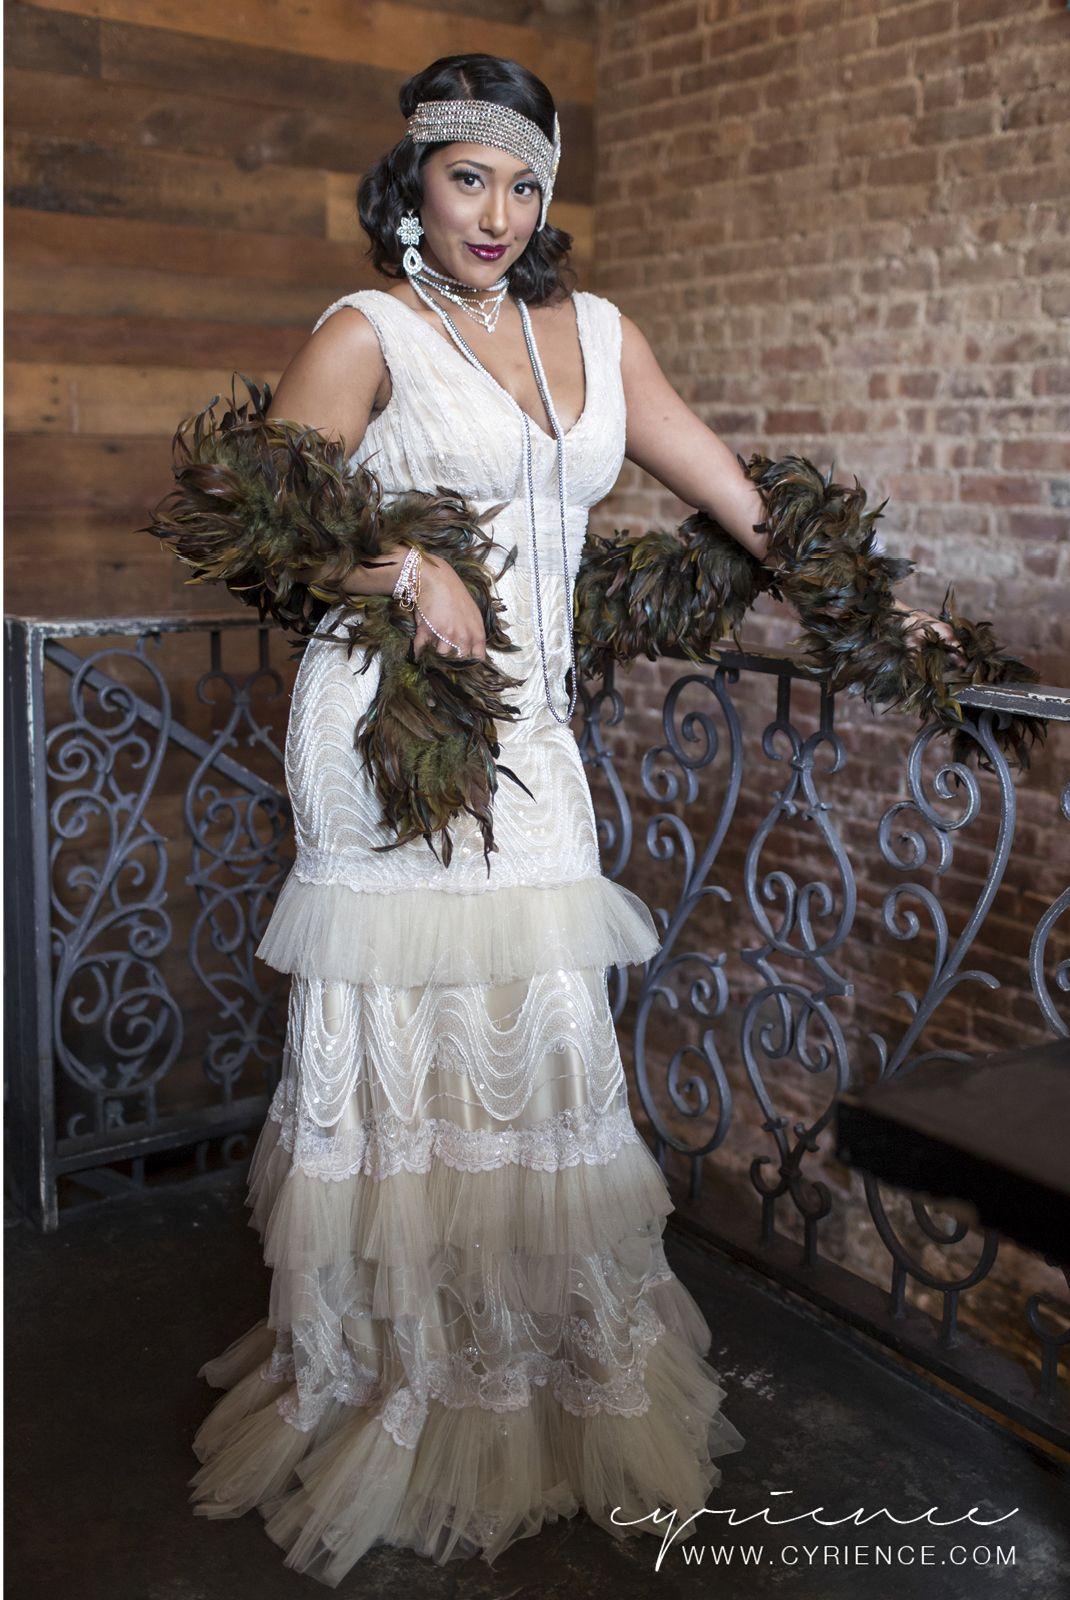 Allison williams wedding dress  Harlem Renaissance Inspired Wedding Shoot featured on BlackBride